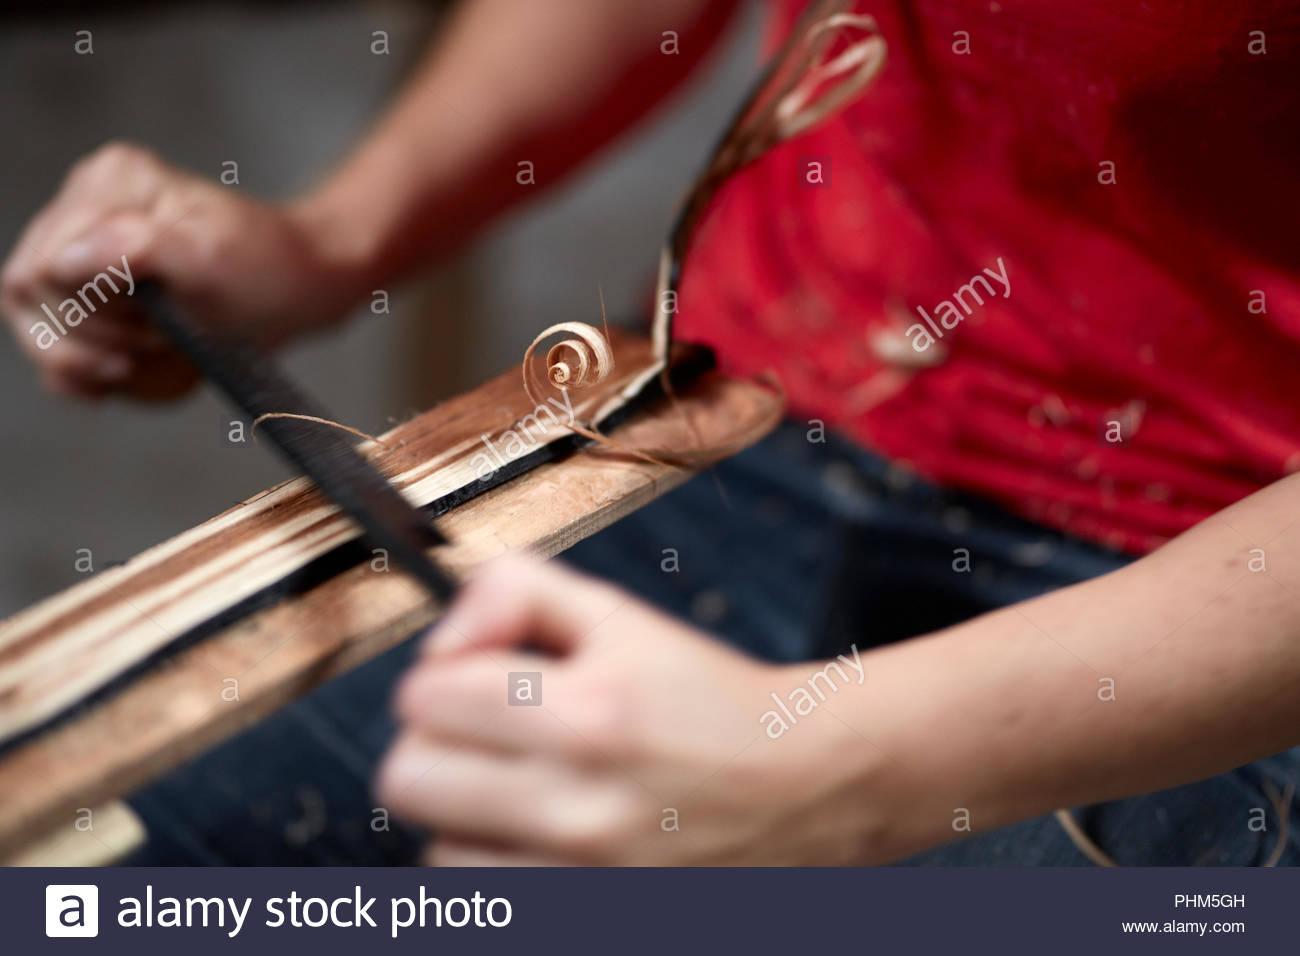 Hände von Frau rasieren Holz Stockbild